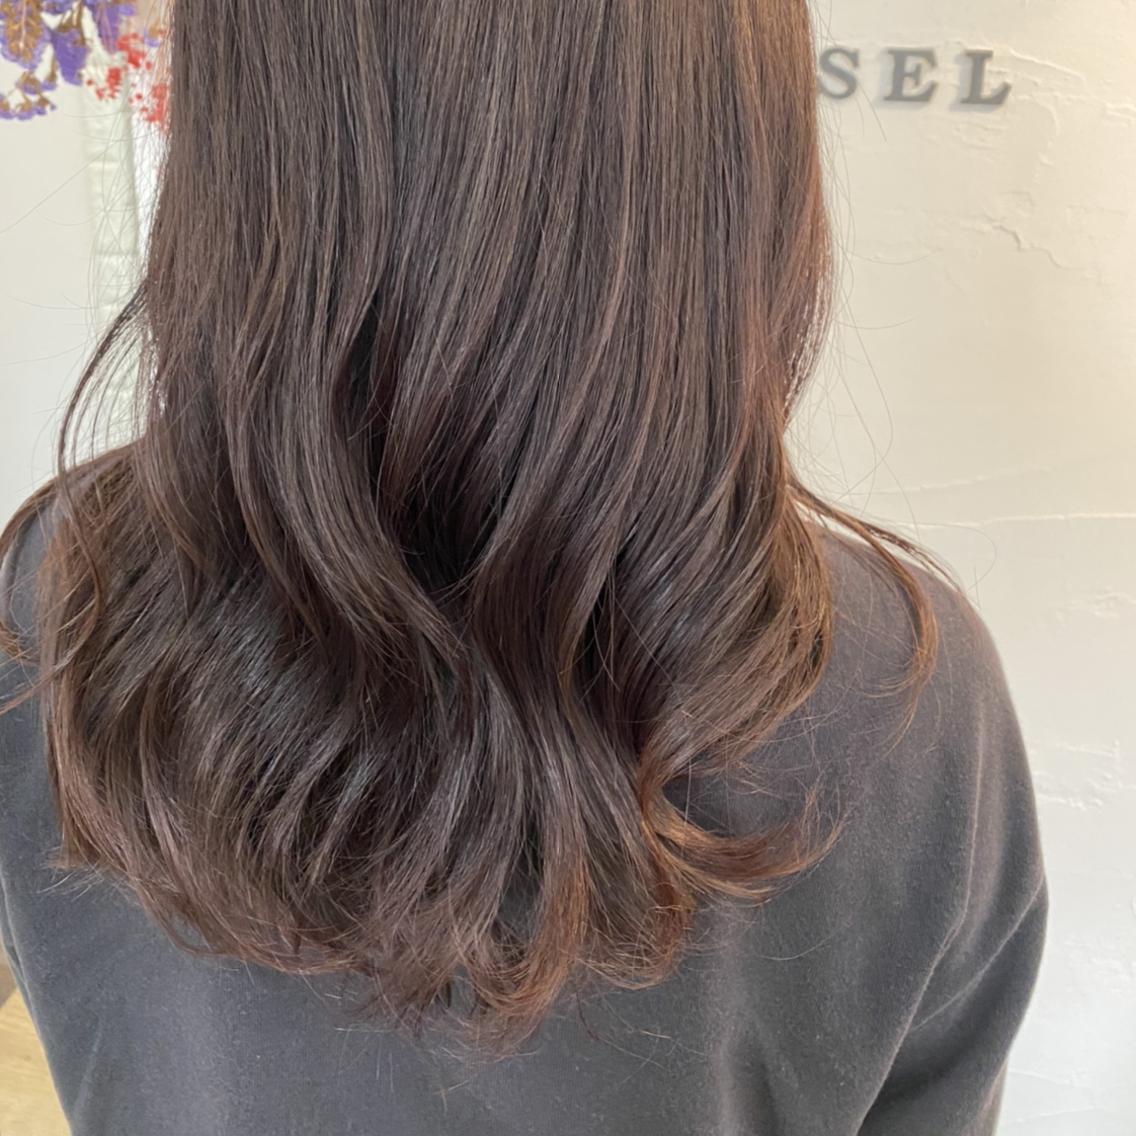 VESSEL&CIEL所属・Hair salon VESSELの掲載